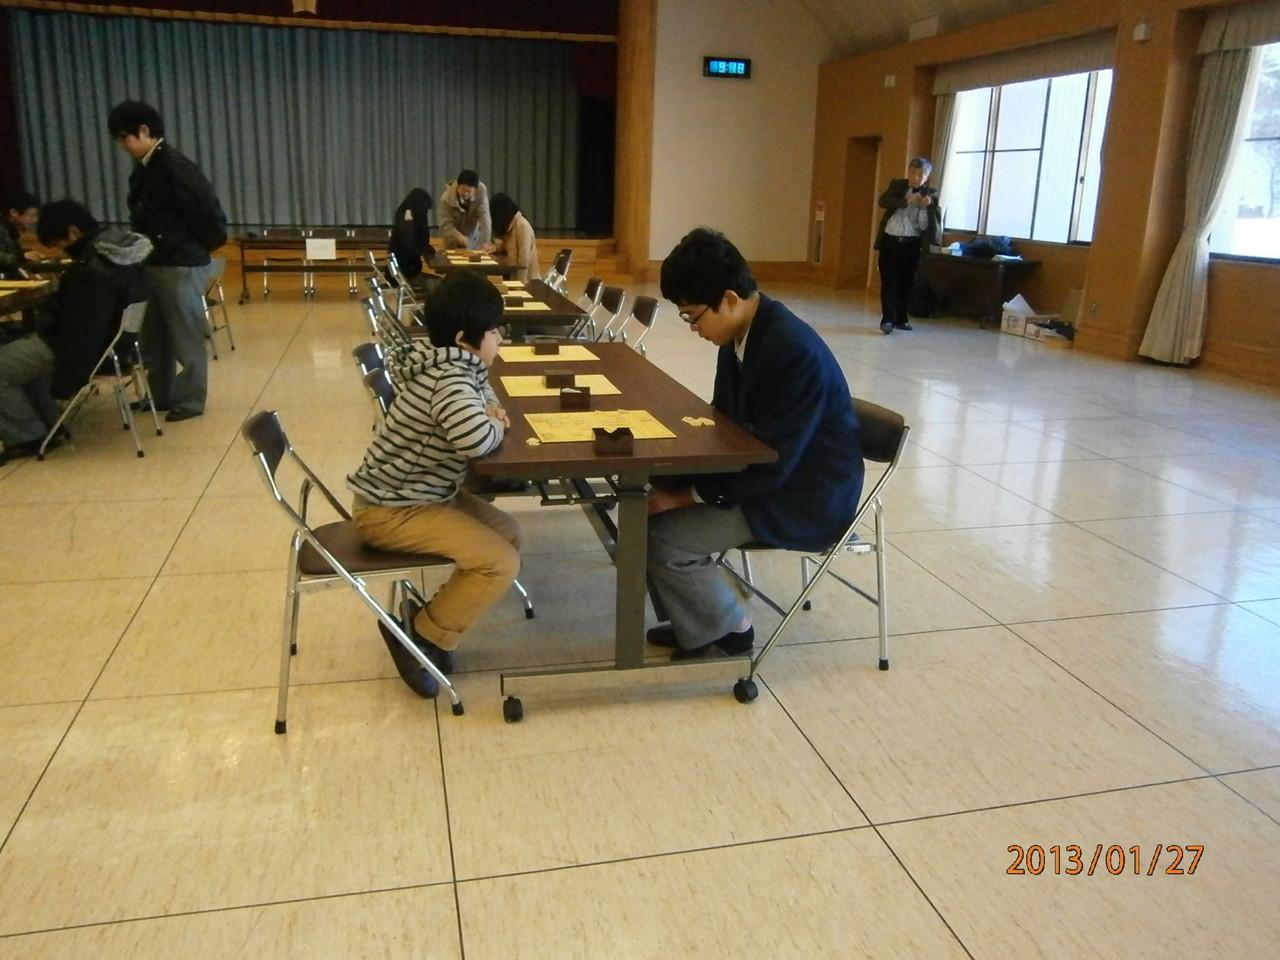 大会1時間前から熱心に練習対局。軽井沢高校強豪1年VS東京の小学生